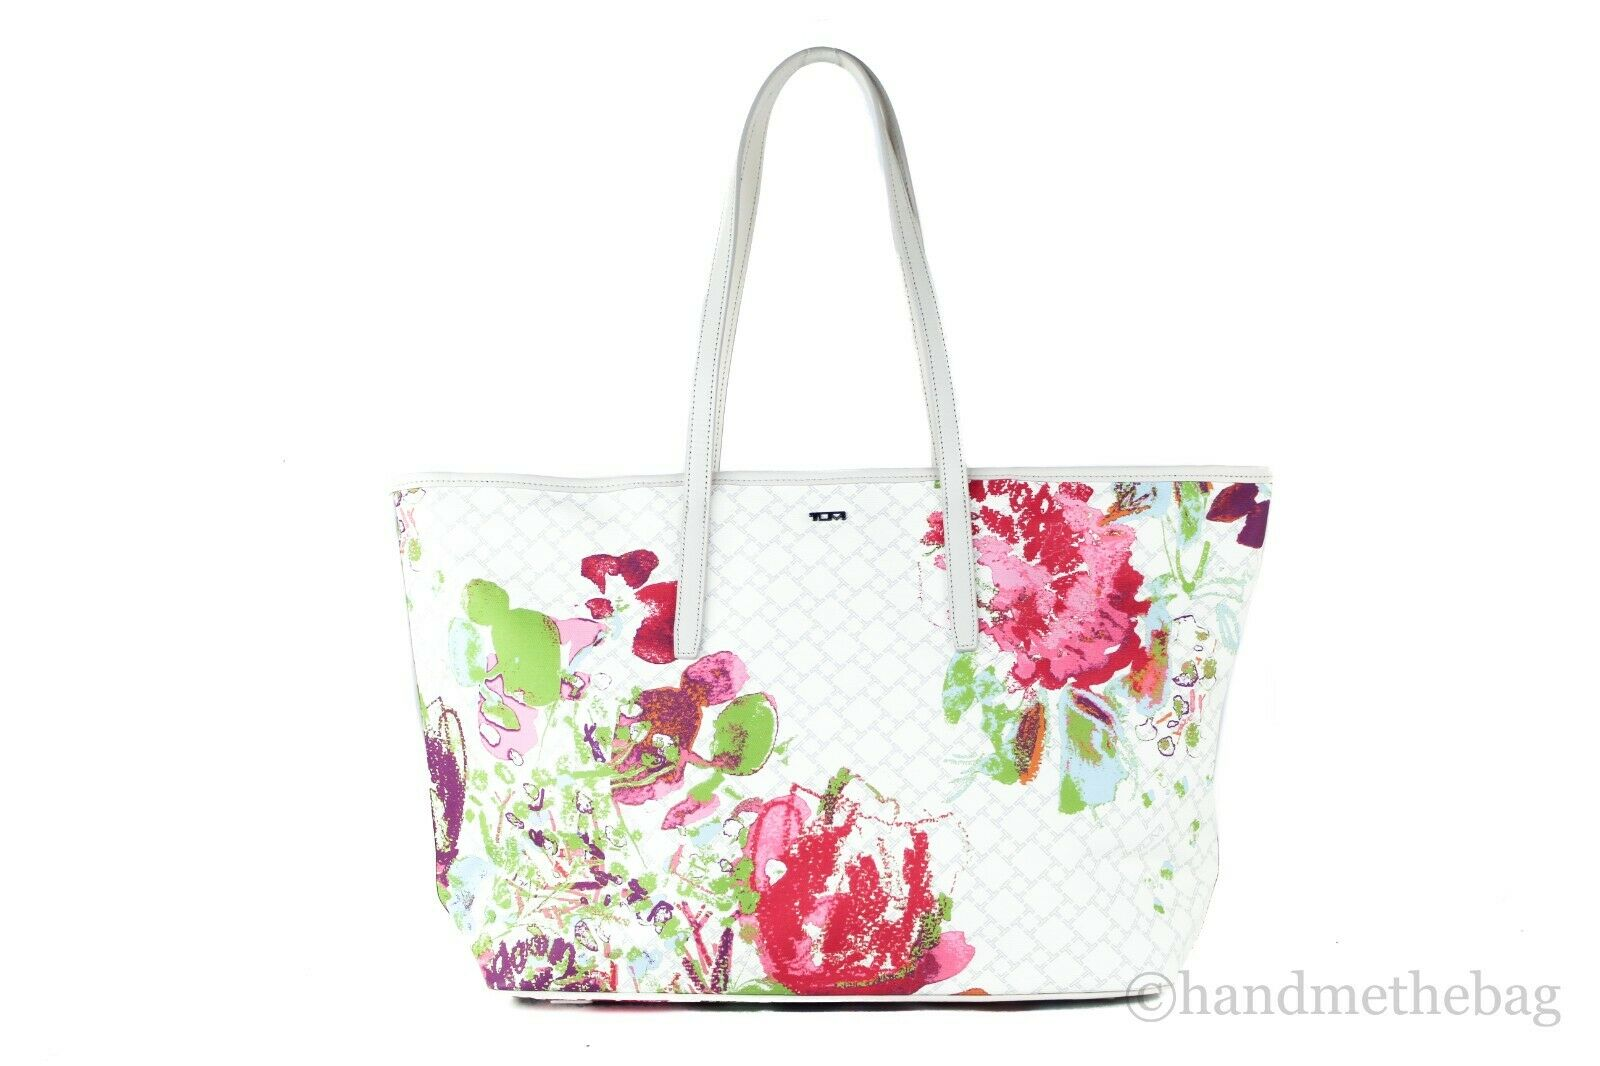 Tumi Everyday Large Coated Canvas Leather Shoulder Tote Bag Carryall Handbag White Floral